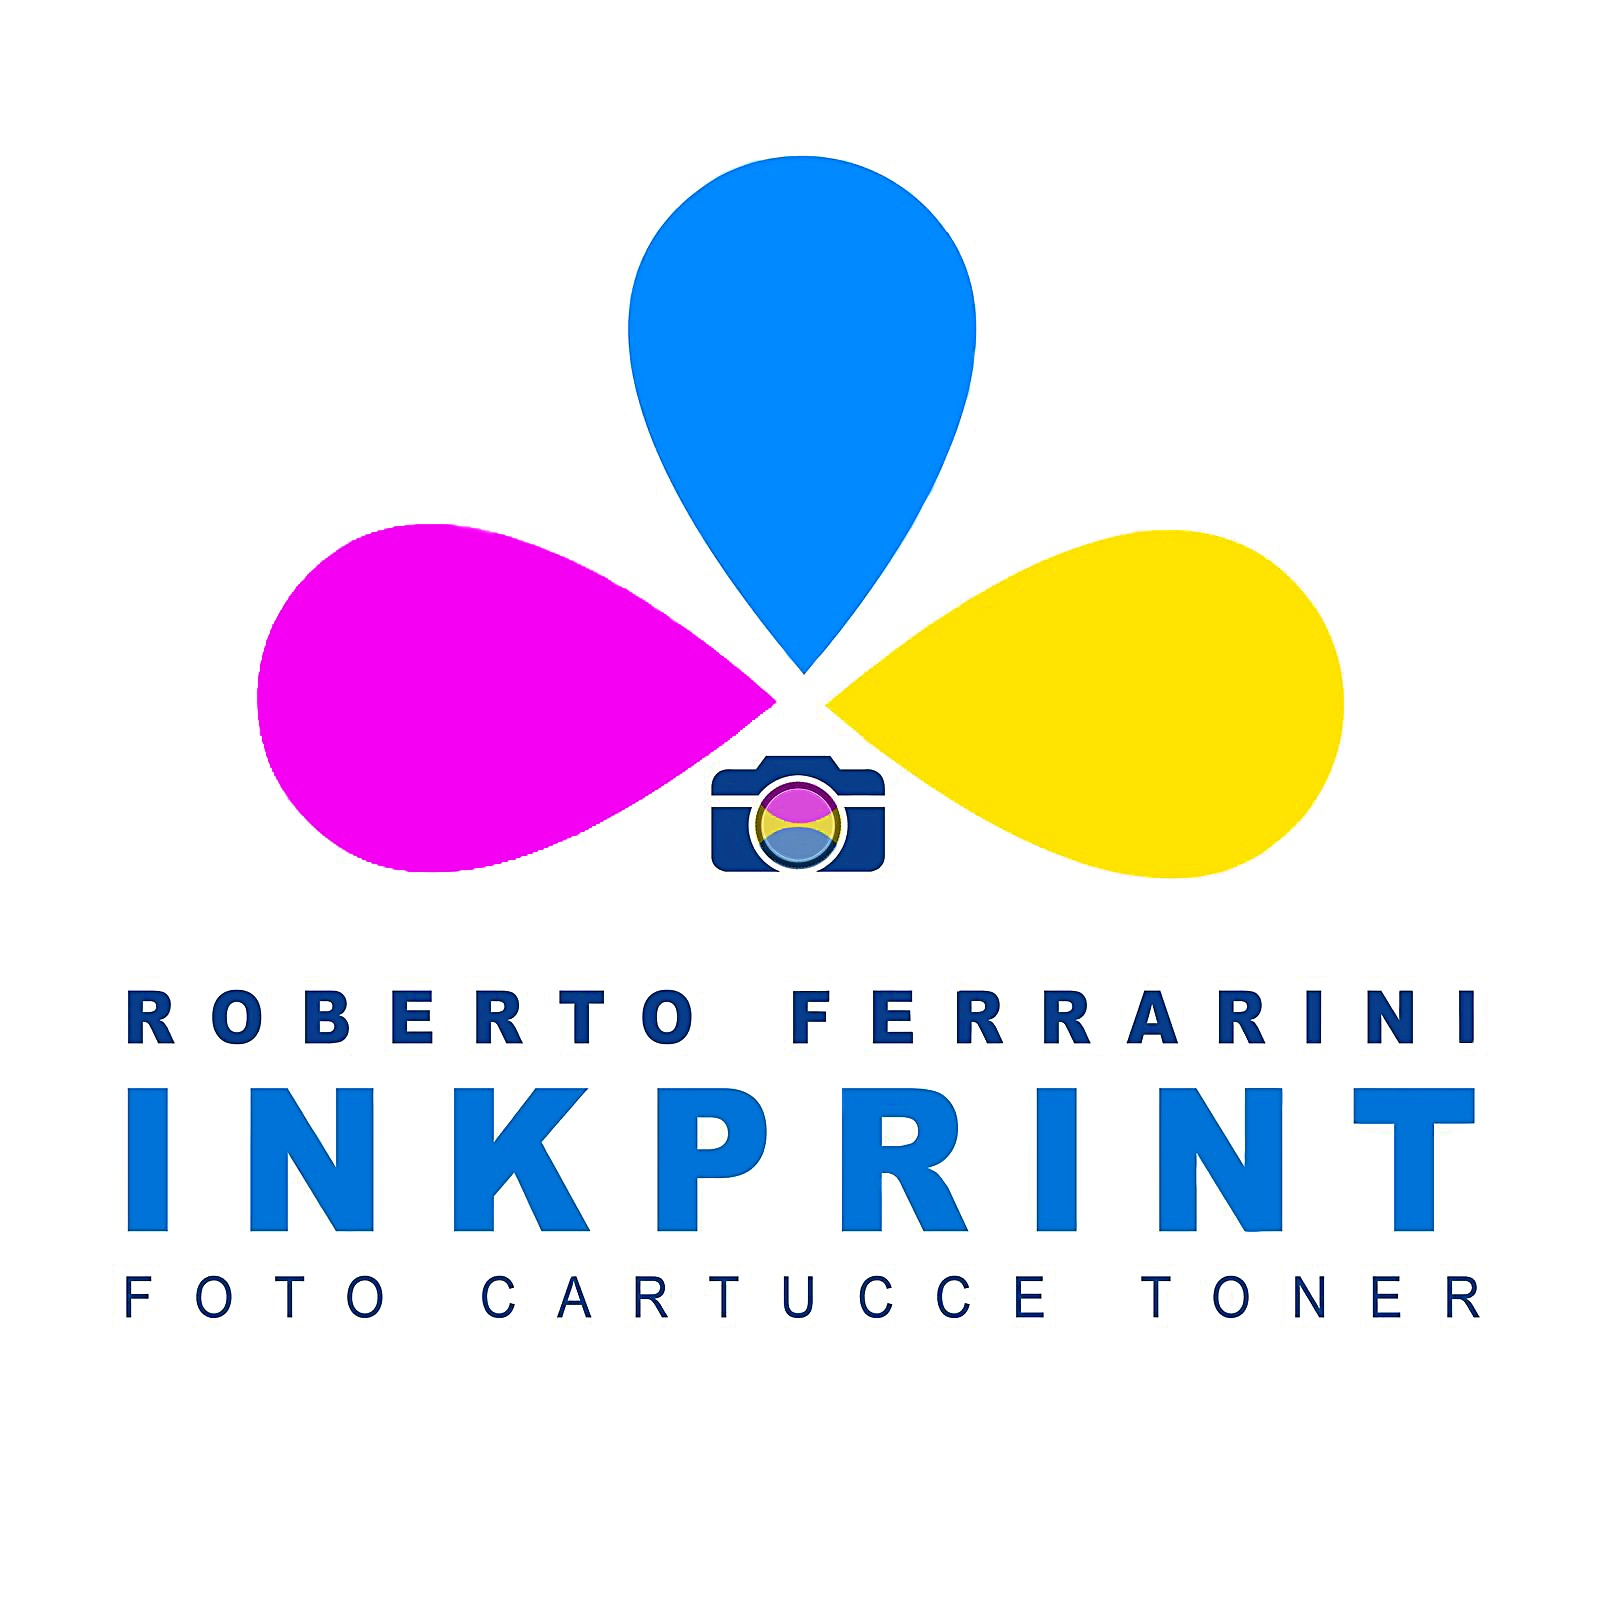 Cartucce Toner Ferrarini